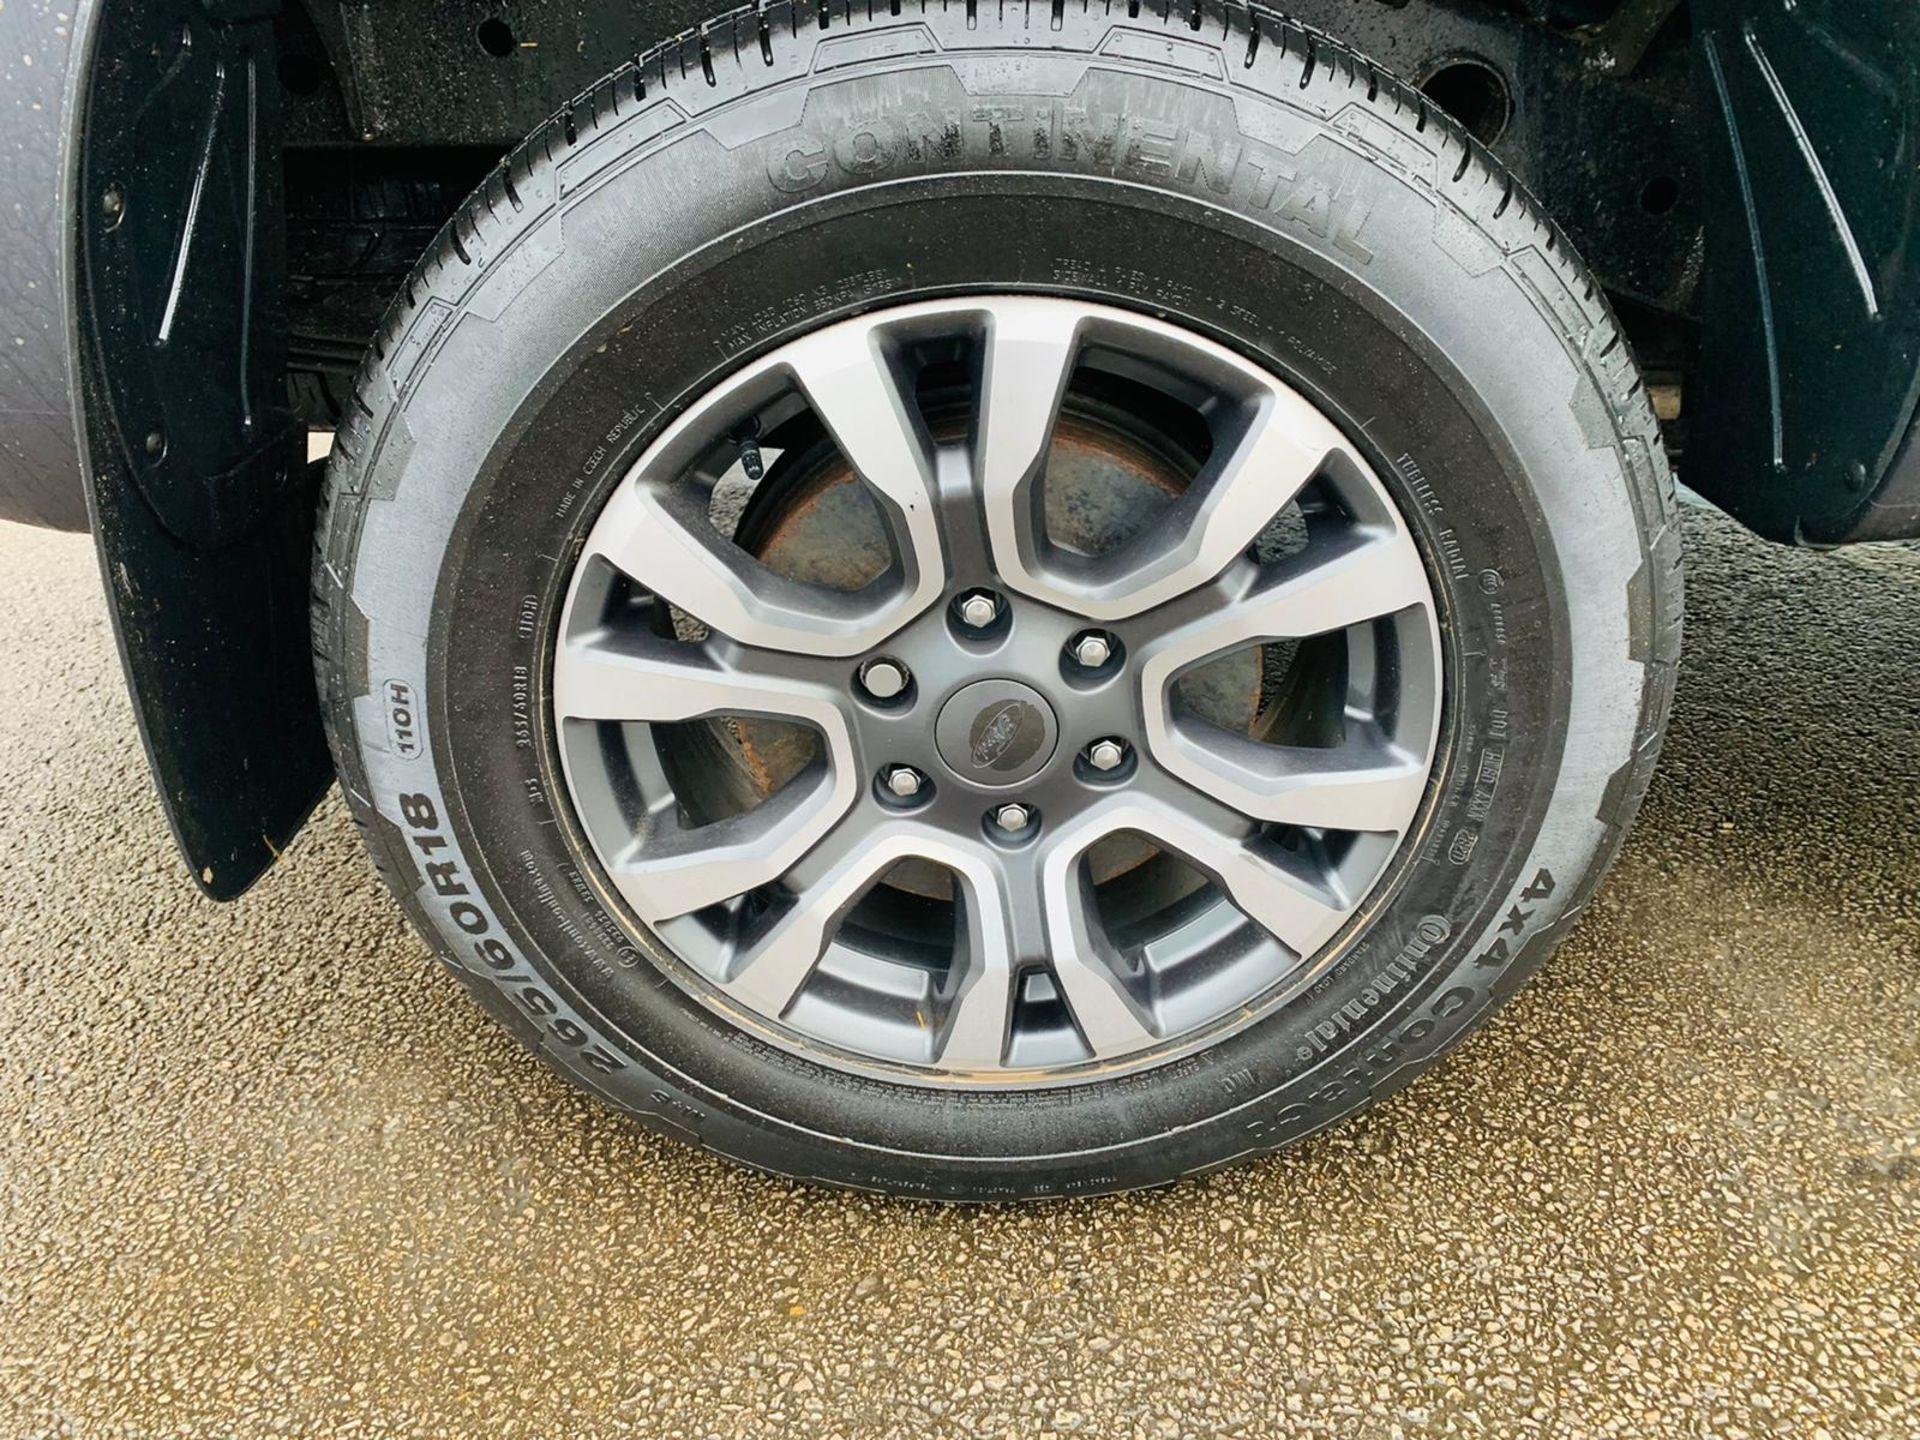 (RESERVE MET) Ford Ranger 2.2 TDCI LTD 4x4 Double Cab 2017 17 Reg - Reversing Cam -Leather - Sat Nav - Image 15 of 32